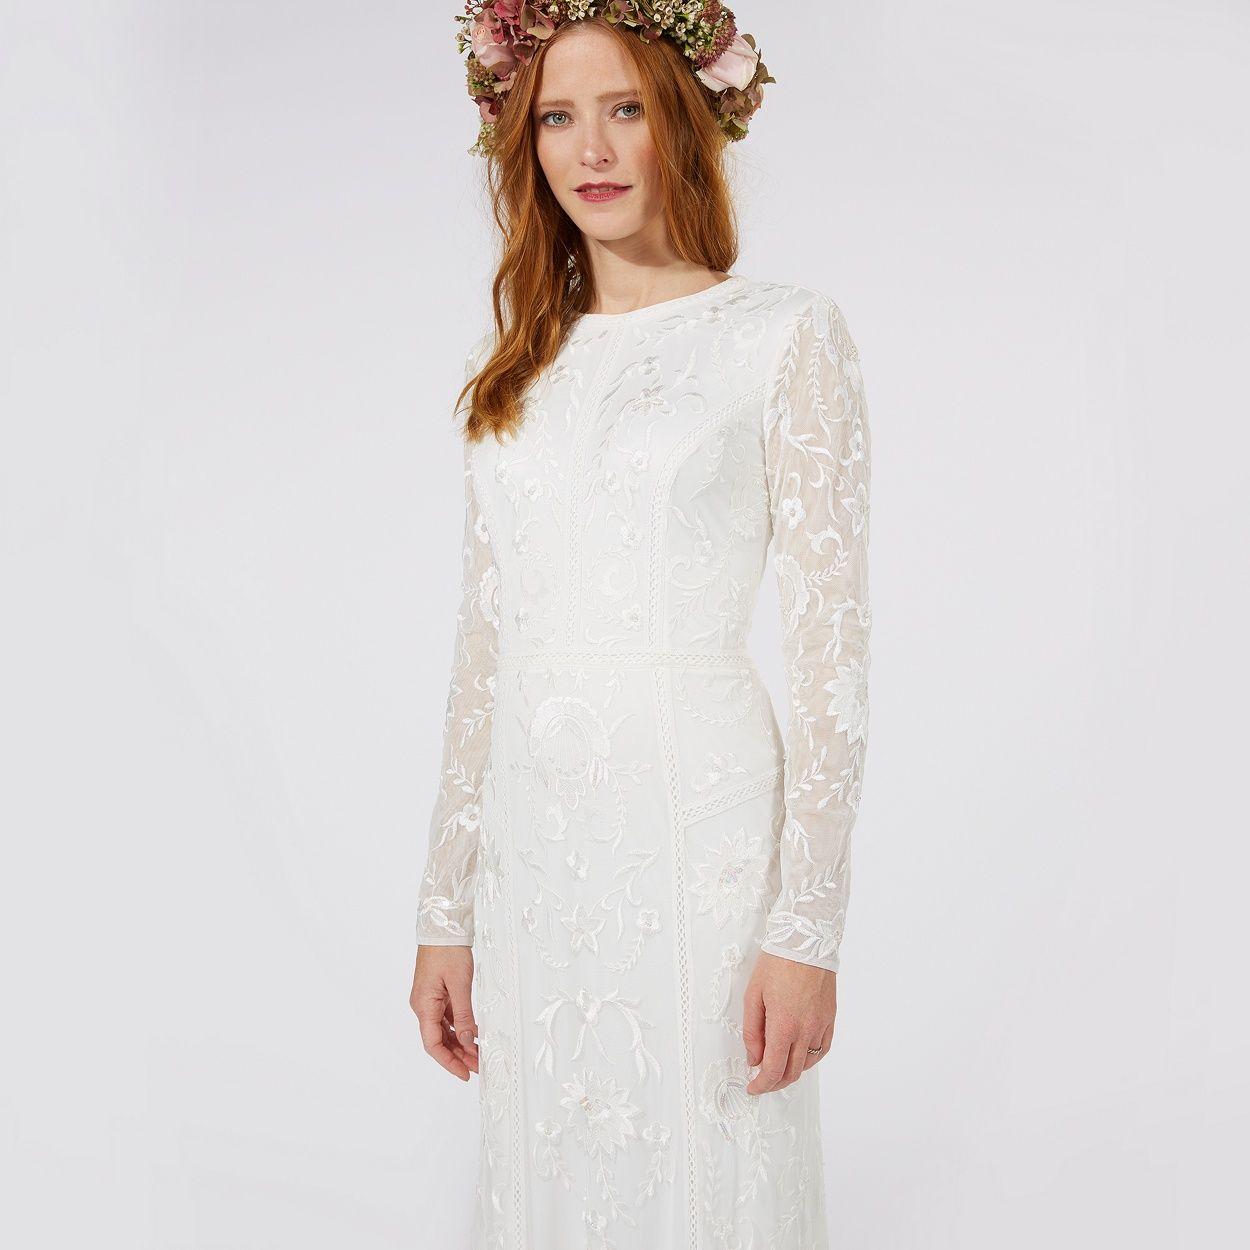 Nine by savannah miller ivory lace bridal dress debenhams nine by savannah miller ivory lace bridal dress debenhams ombrellifo Gallery